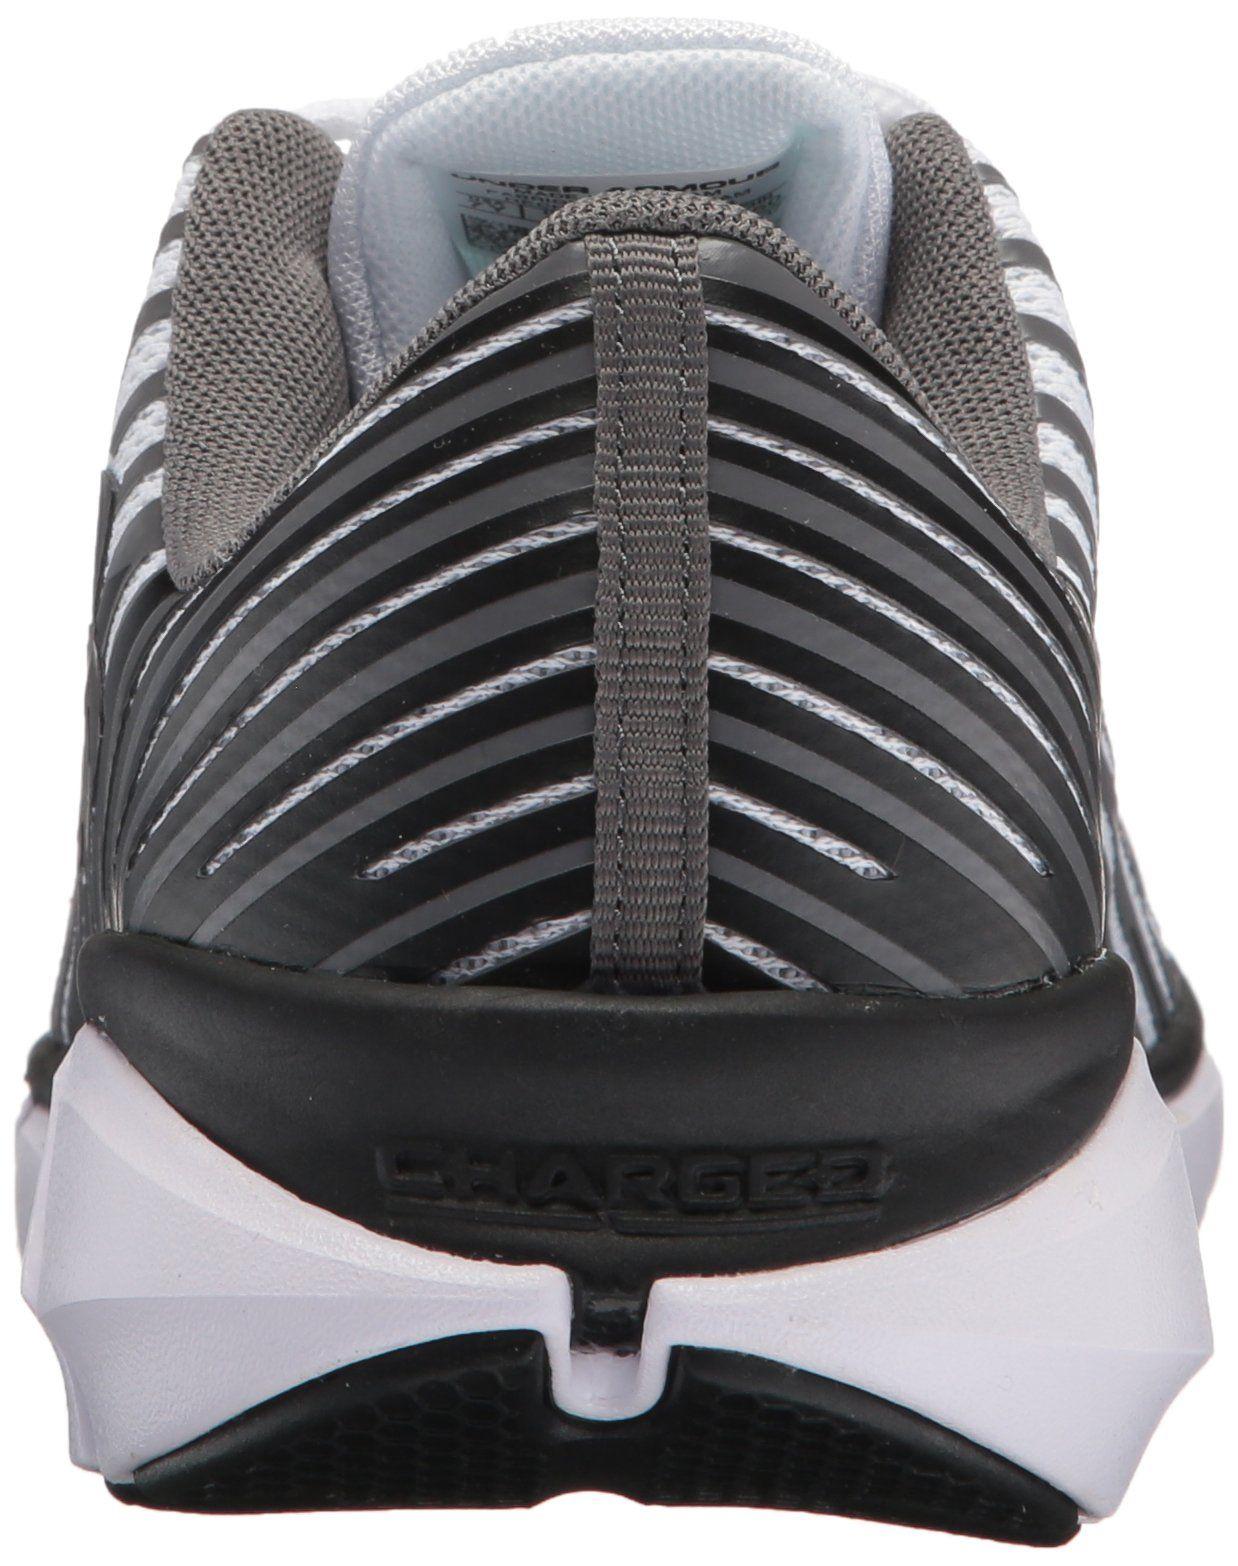 6c1bb94e5d416 Under Armour Boys Grade School X Level Scramjet Remix Athletic Shoe White  102 Graphite 4